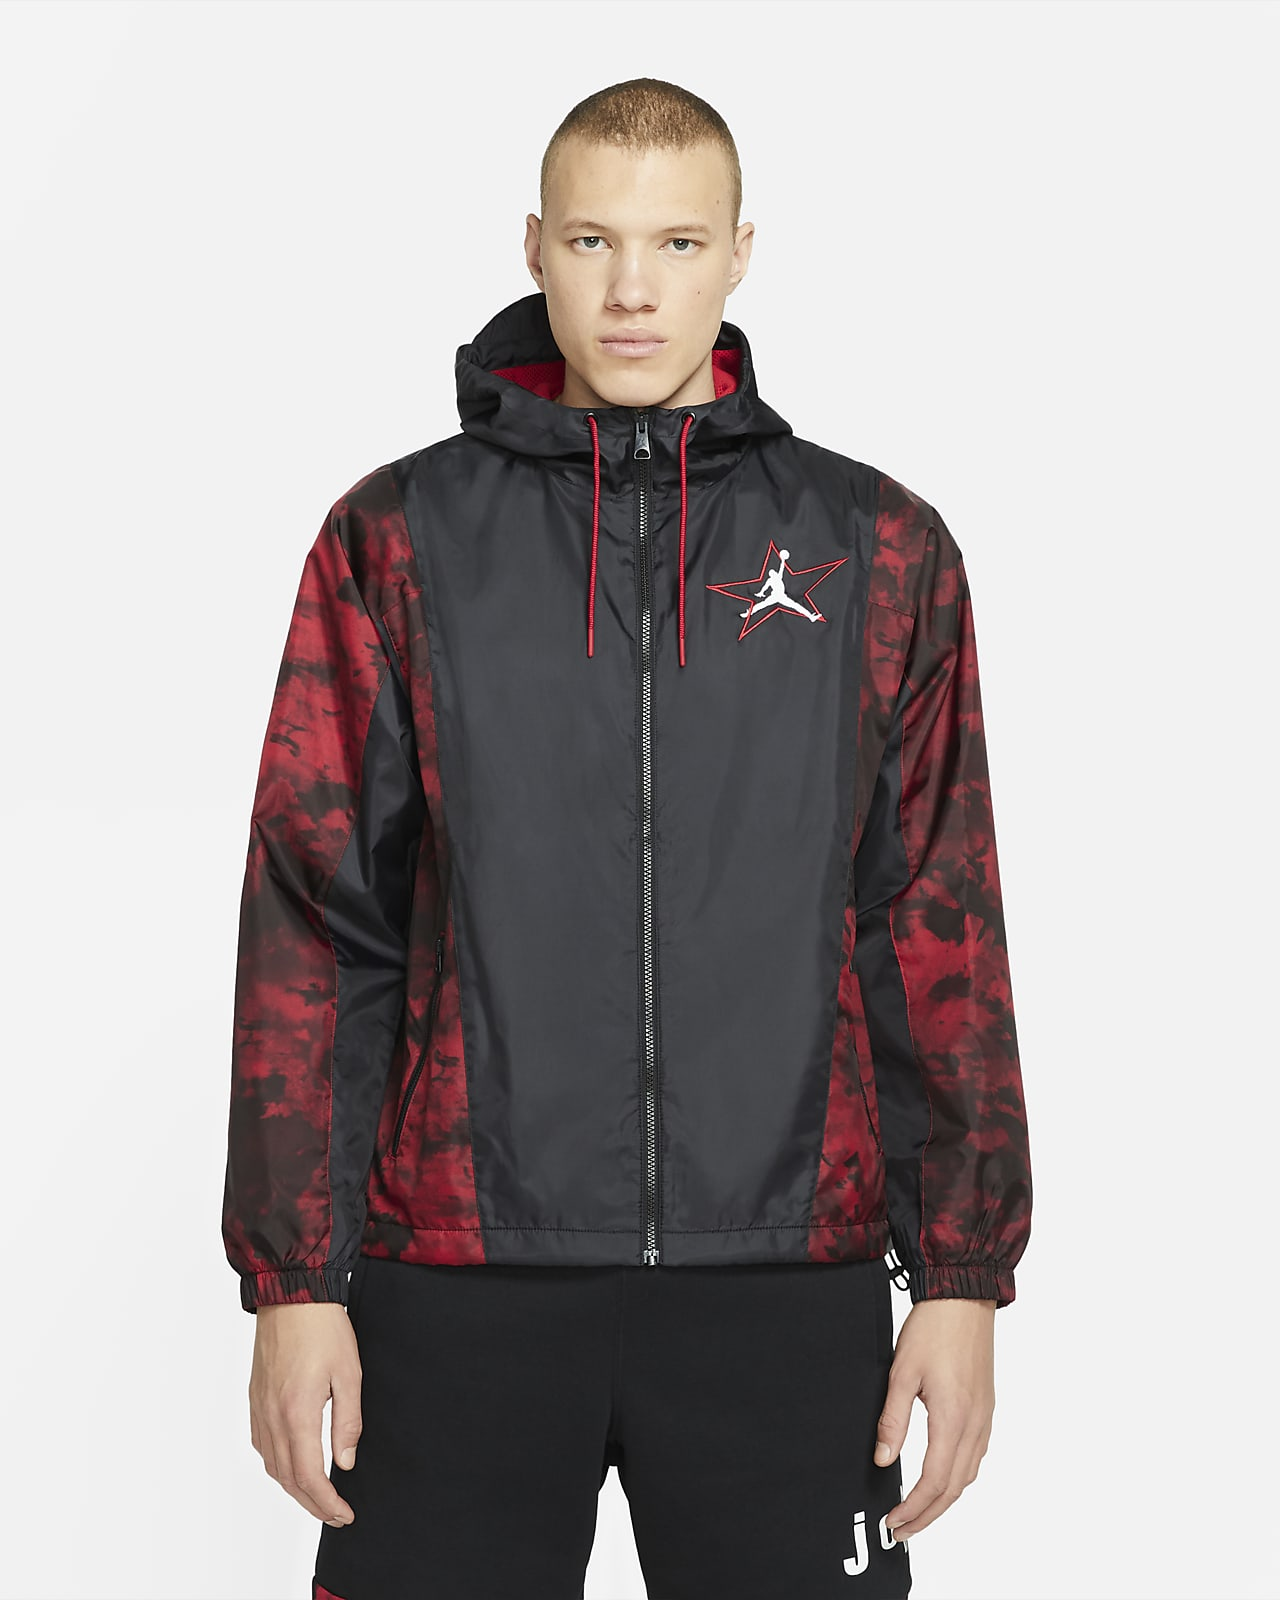 Мужская легкая куртка Jordan Legacy AJ6